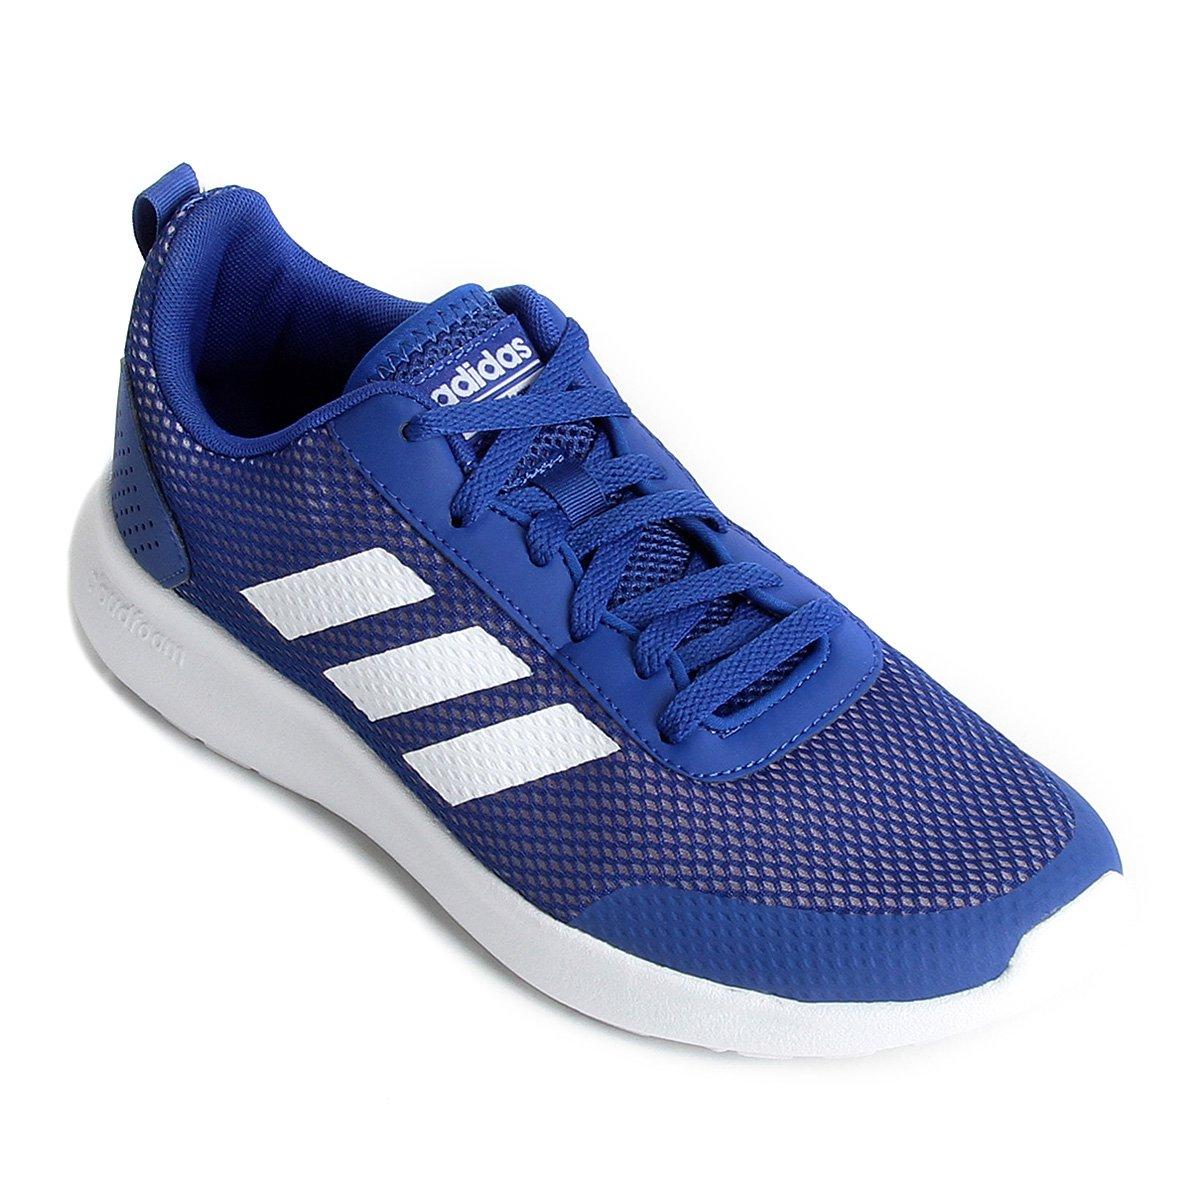 1ca6bb09c3 Tênis Adidas CF Element Race Feminino - Compre Agora